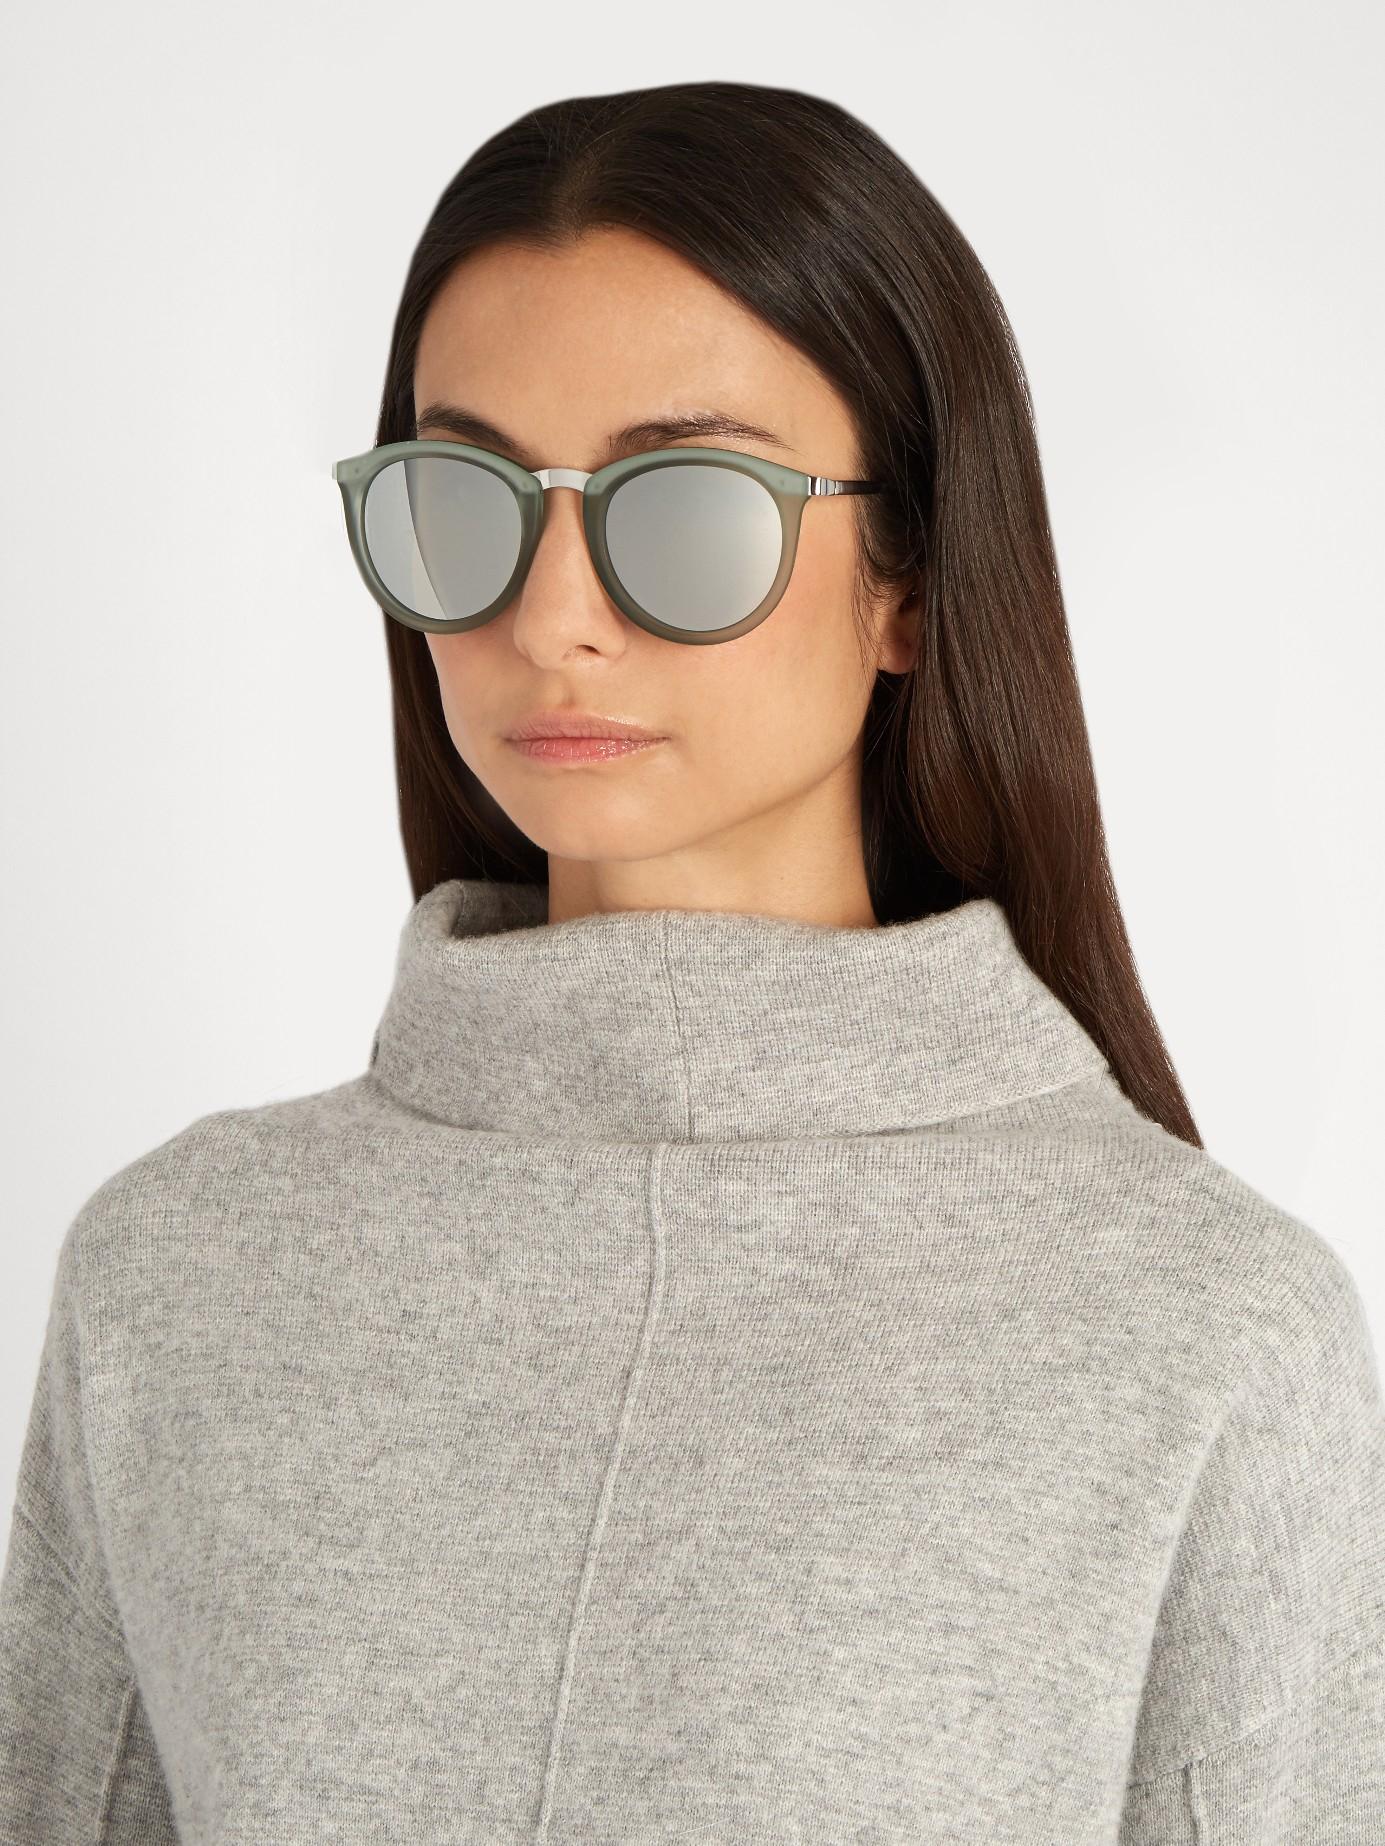 56607f1ff8f Lyst - Le Specs No Smirking Round-frame Sunglasses in Green